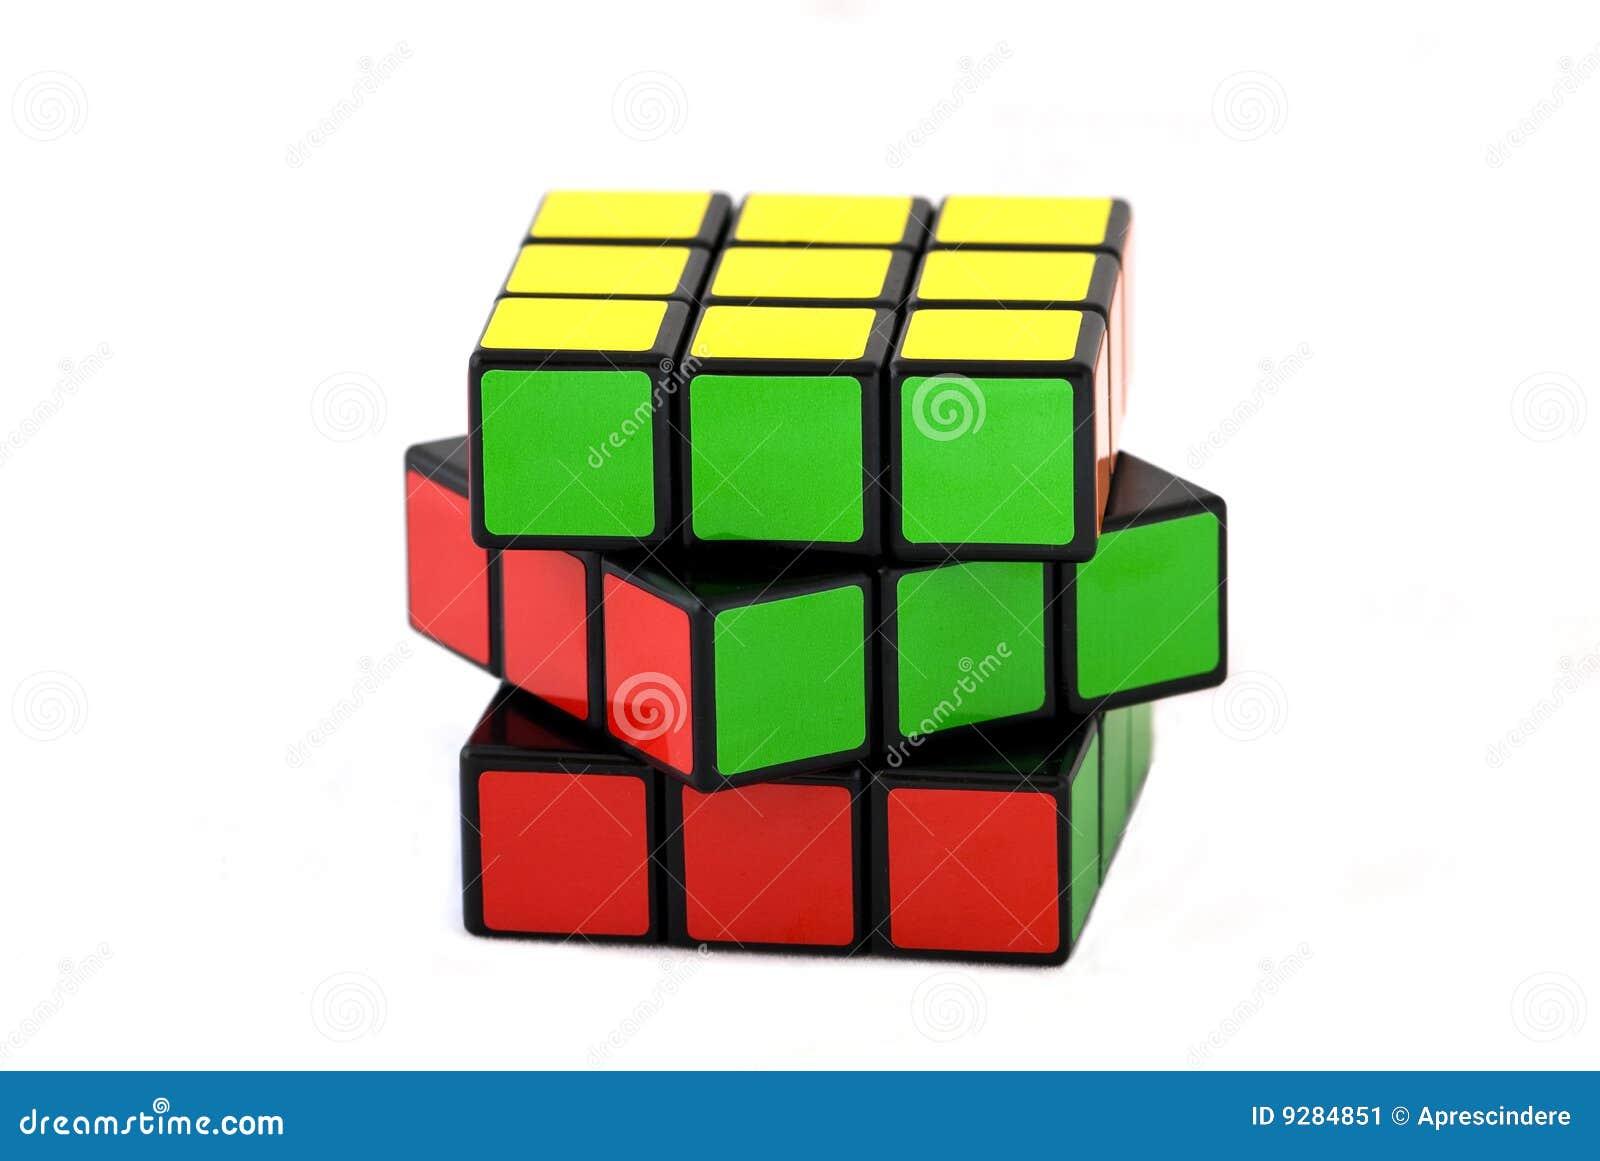 Cubo de s de Rubik